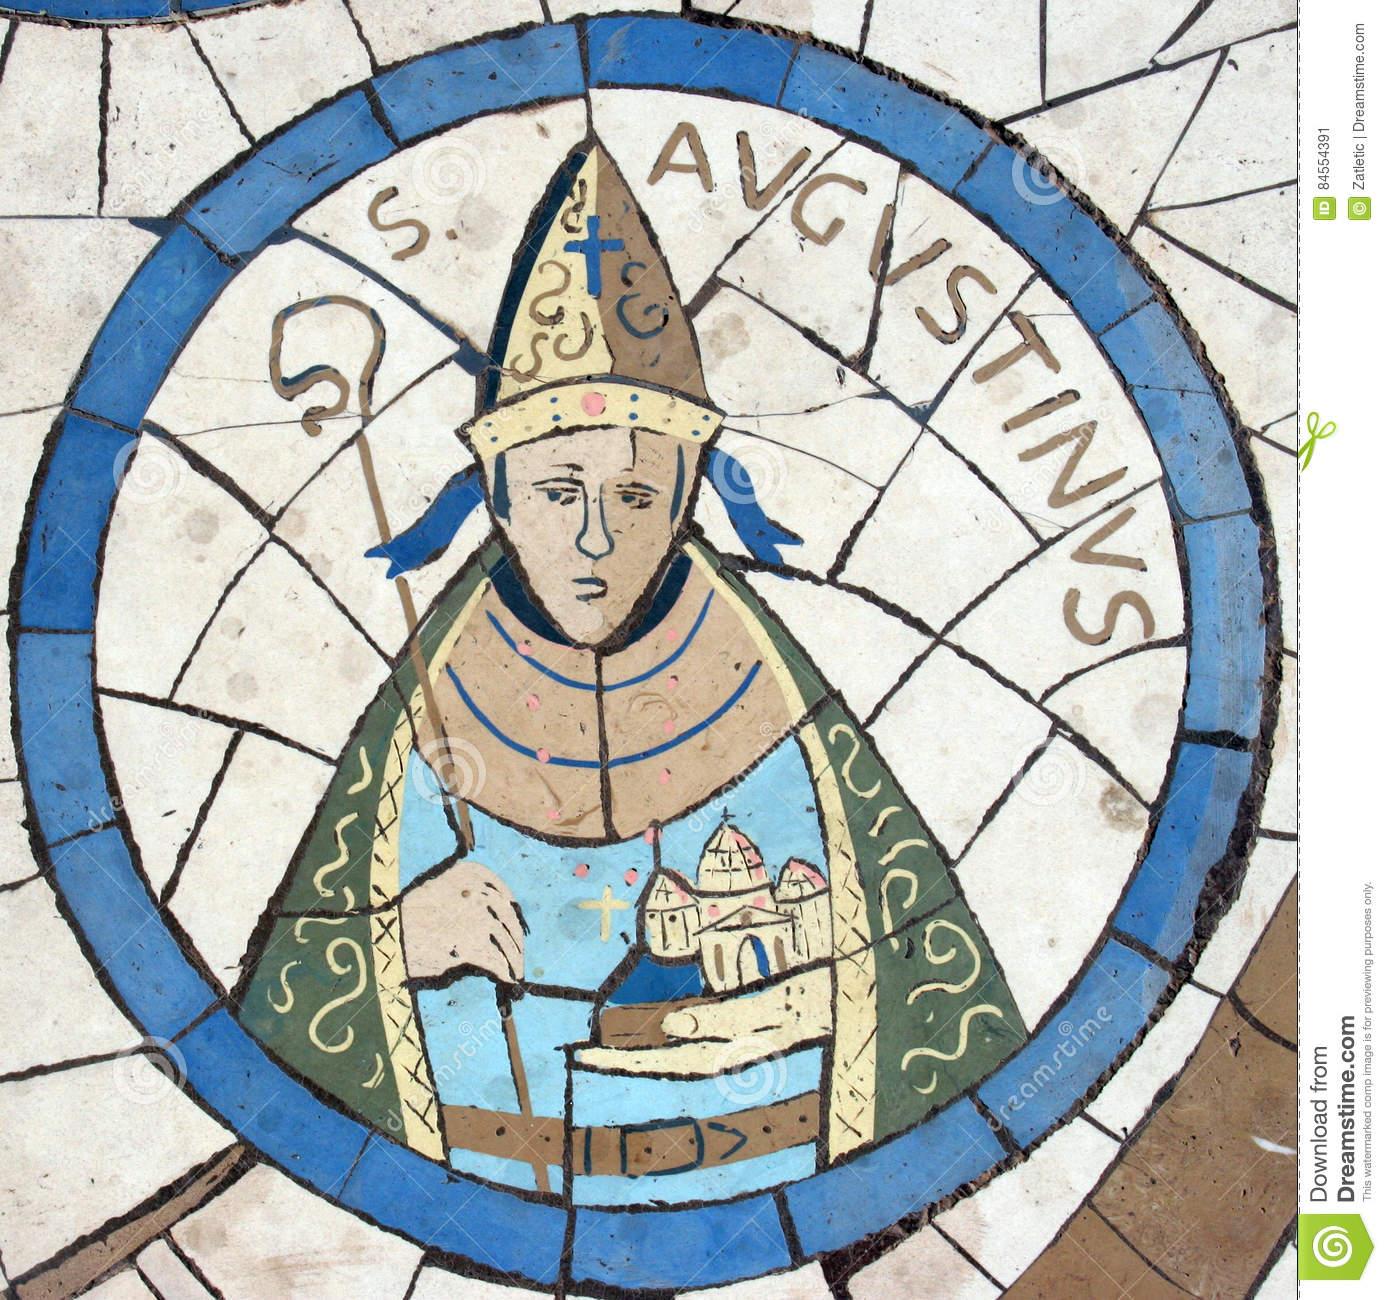 saint-augustine-hippo-mosaic-front-church-mount-beatitudes-galilee-israel-84554391